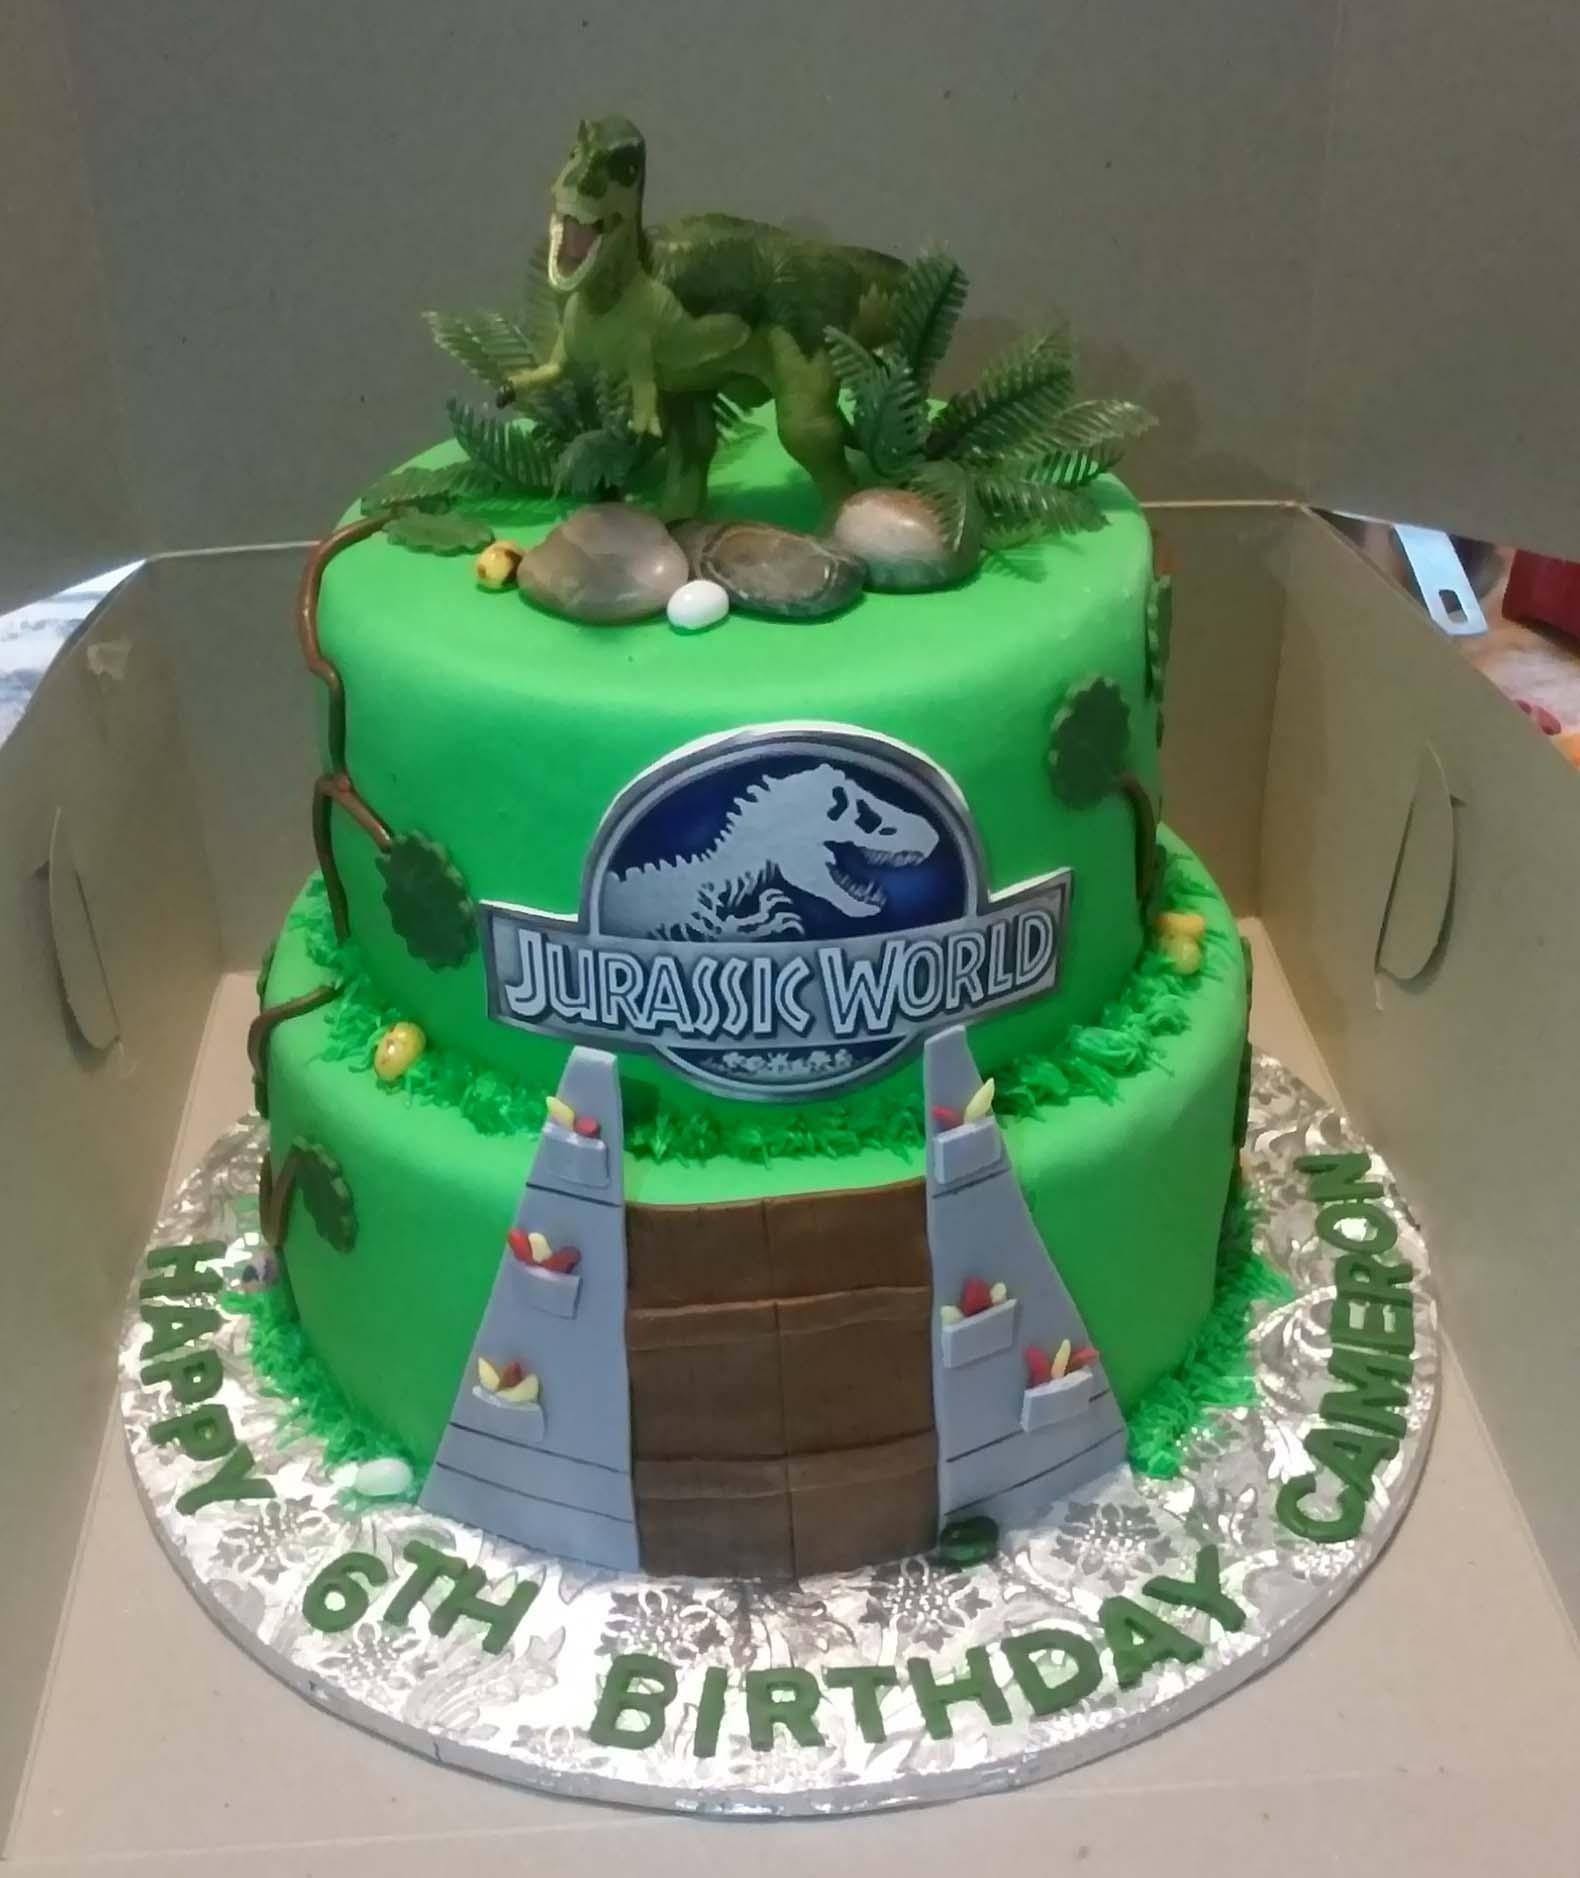 Lego Jurassic World Cake Images : msa3118 s Cake Central Gallery